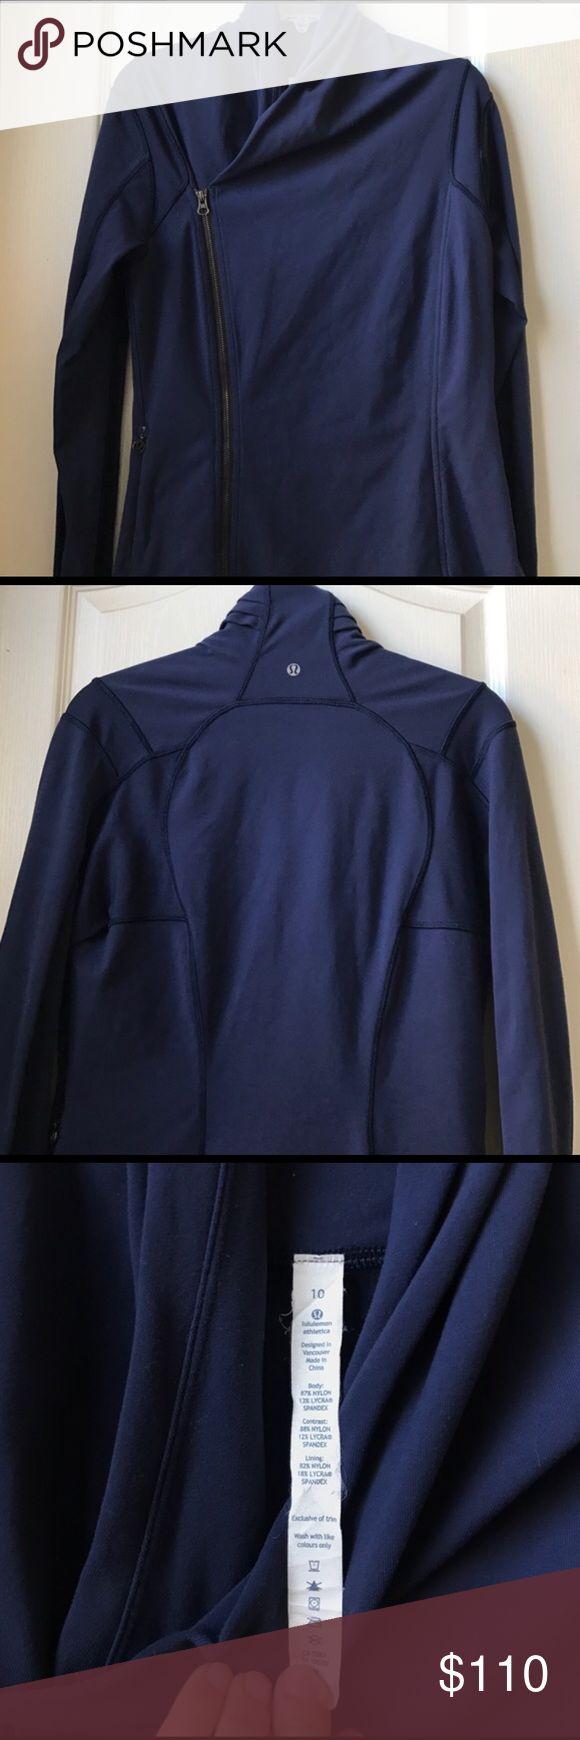 WEEKEND SALE - Lululemon Bhakti Jacket Deep Navy EUC, just too big for me, happy to sell for less via 🅿️🅿️! lululemon athletica Jackets & Coats